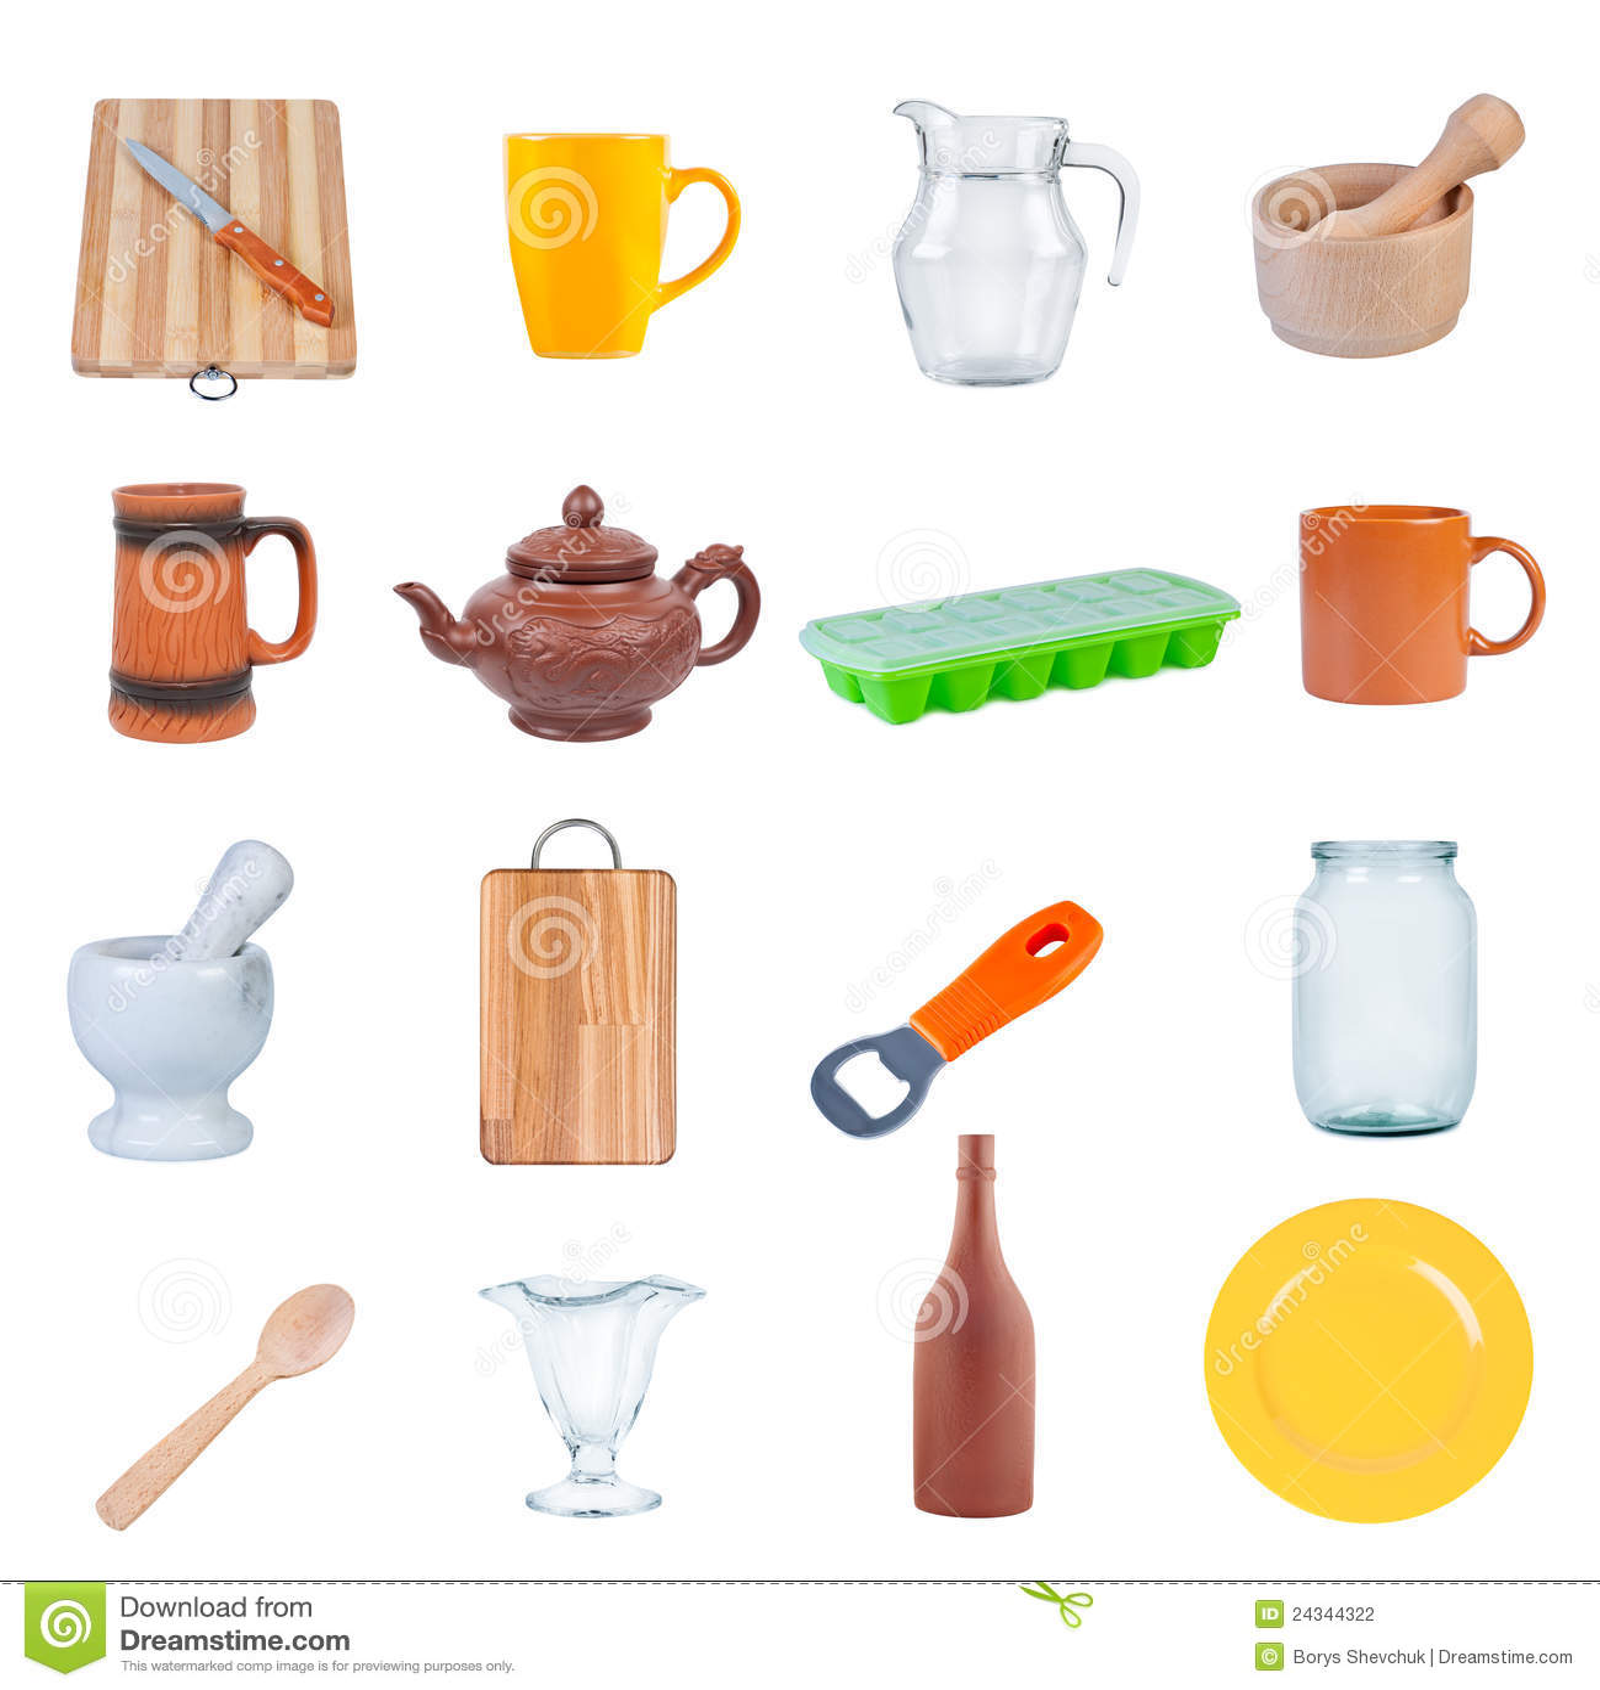 Dream Kitchen Utensils: Set Kitchen Utensils. Stock Photo. Image Of Appliances